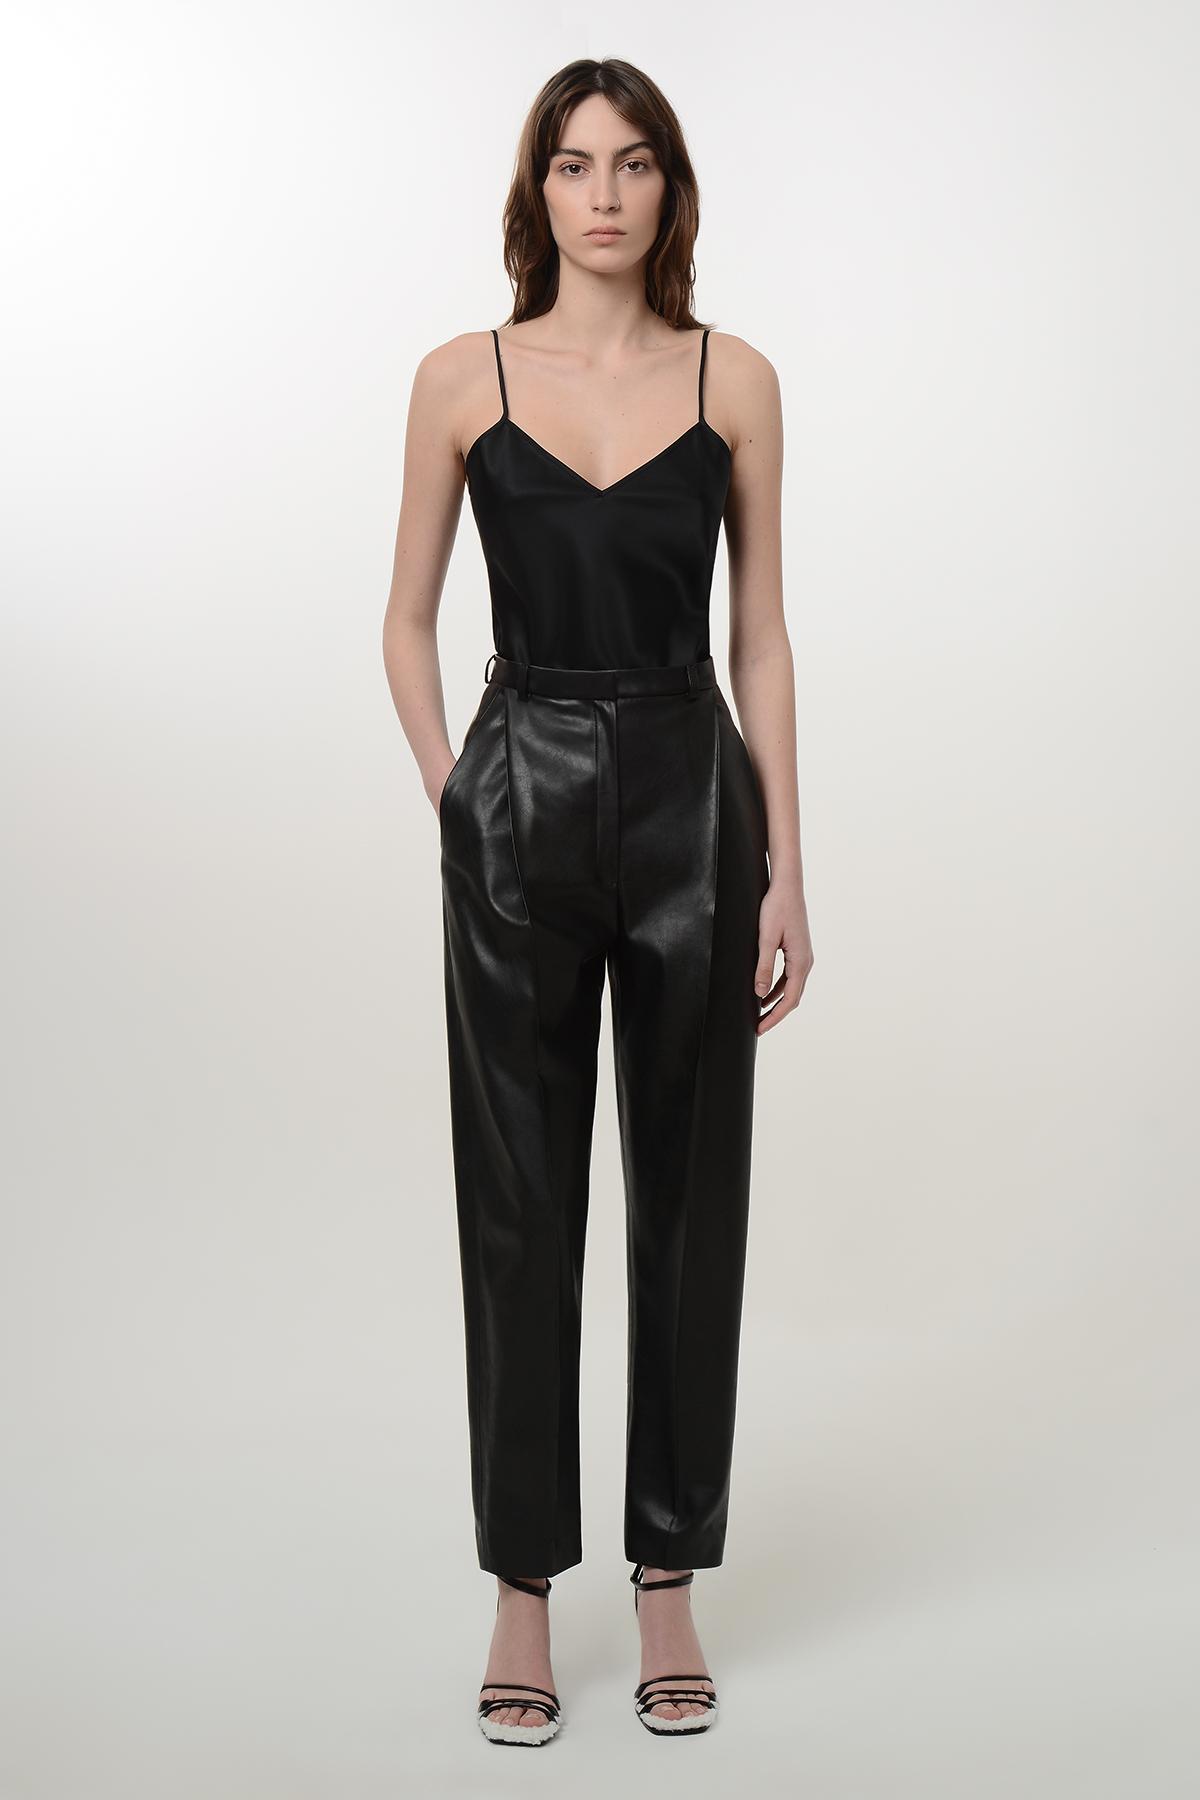 High waisted vegan leather paggy pants